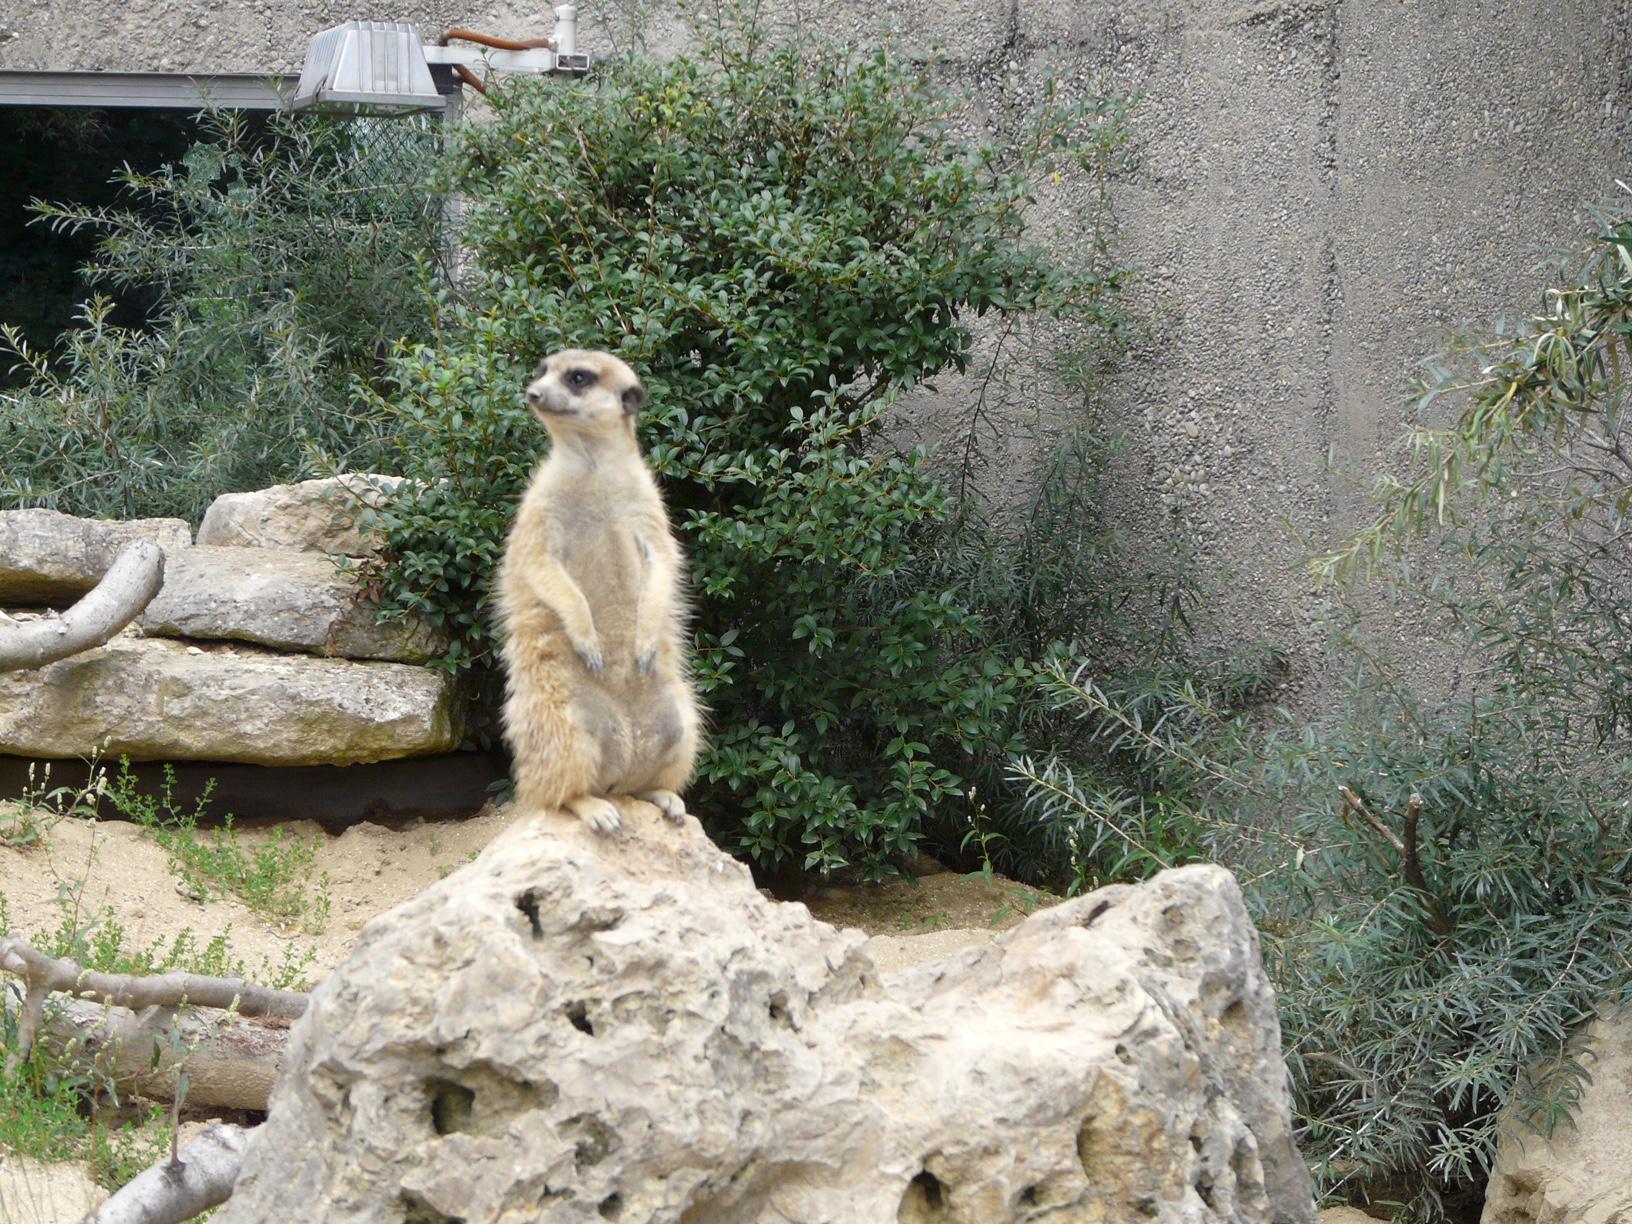 Зоопарк за галене в Швейцария - сурикатите